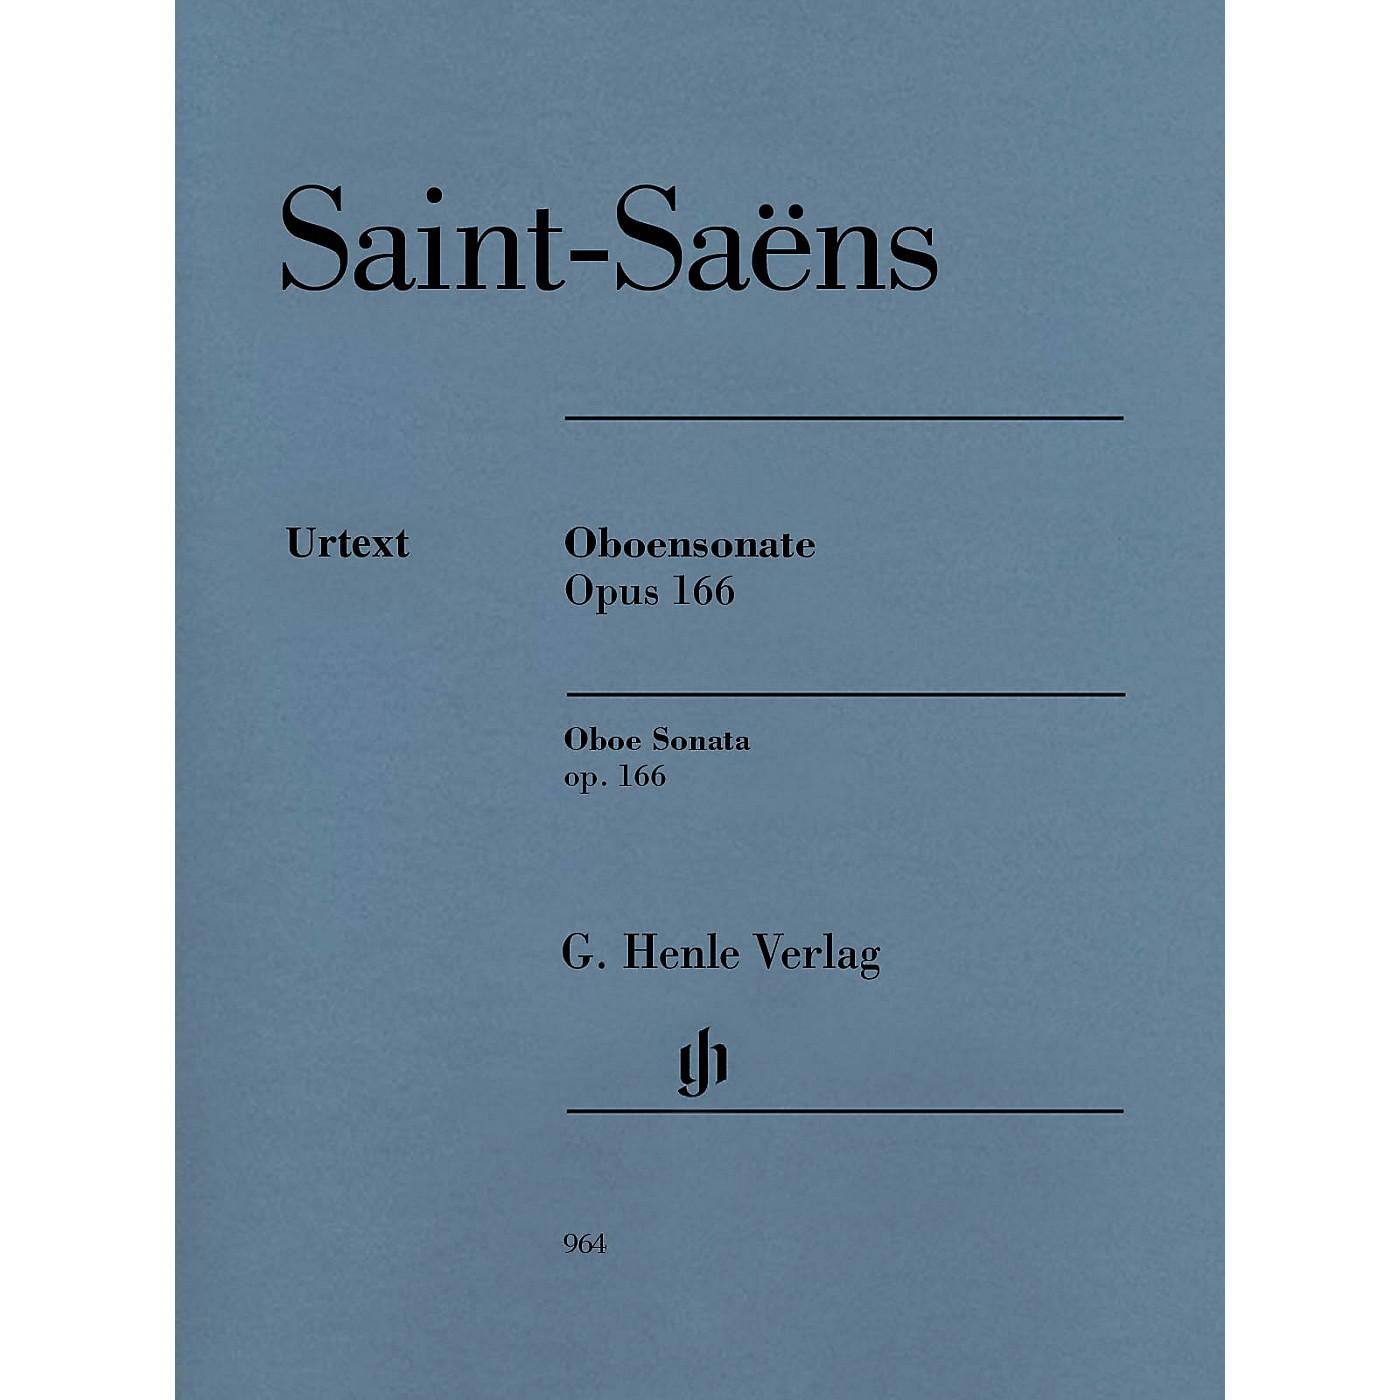 G. Henle Verlag Oboe Sonata, Op 166 Henle Music Folios Book by Camille Saint-Saëns Edited by Peter Jost thumbnail